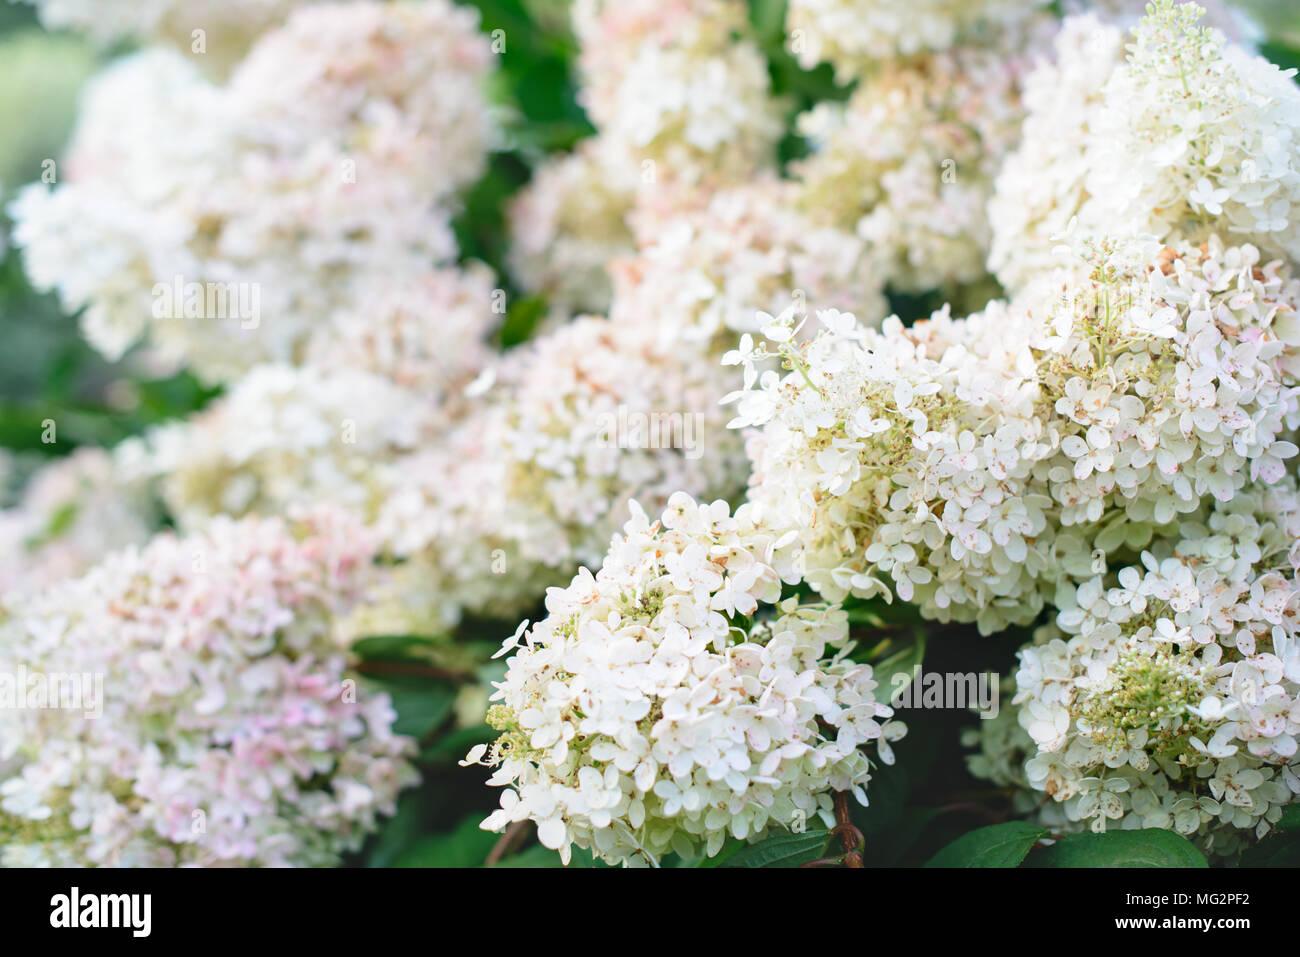 White Hydrangea Flowers In A Garden Over Blurred Background Stock